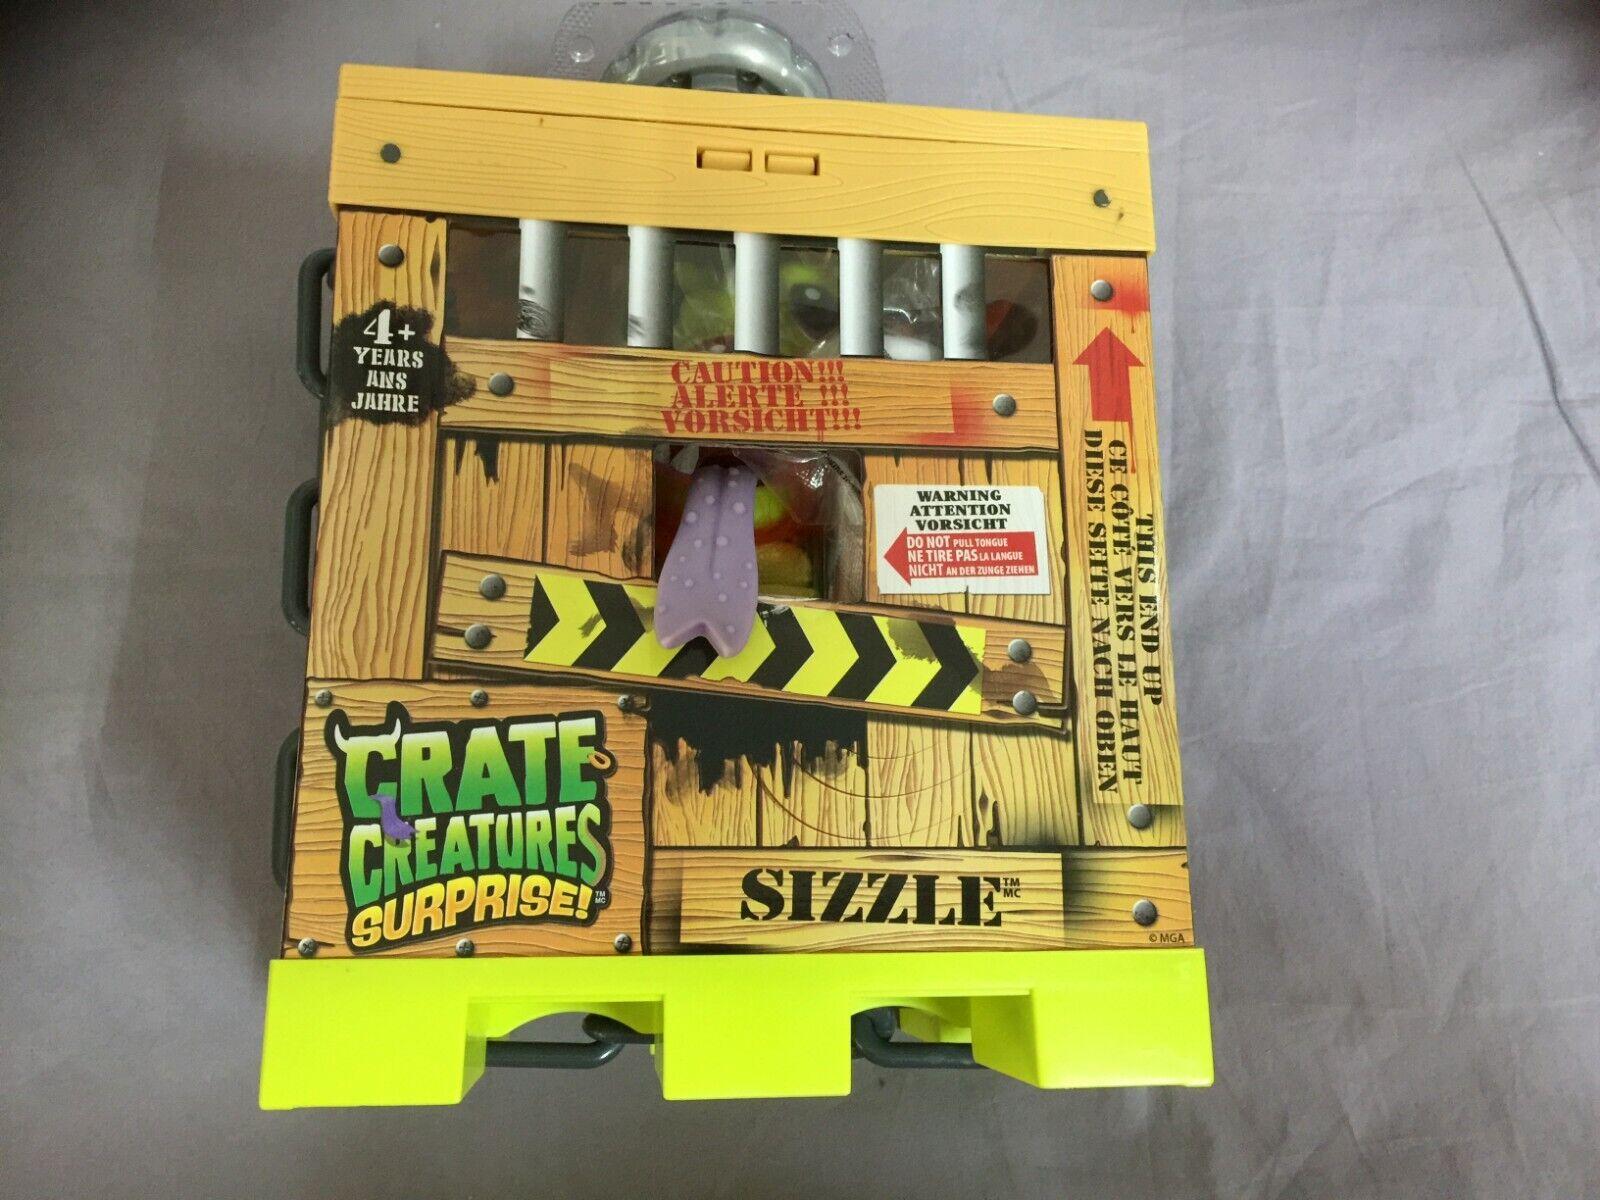 Crate Creatures Surprise  - Figur Sizzle - Neu & Ovp - MGA Entertainment